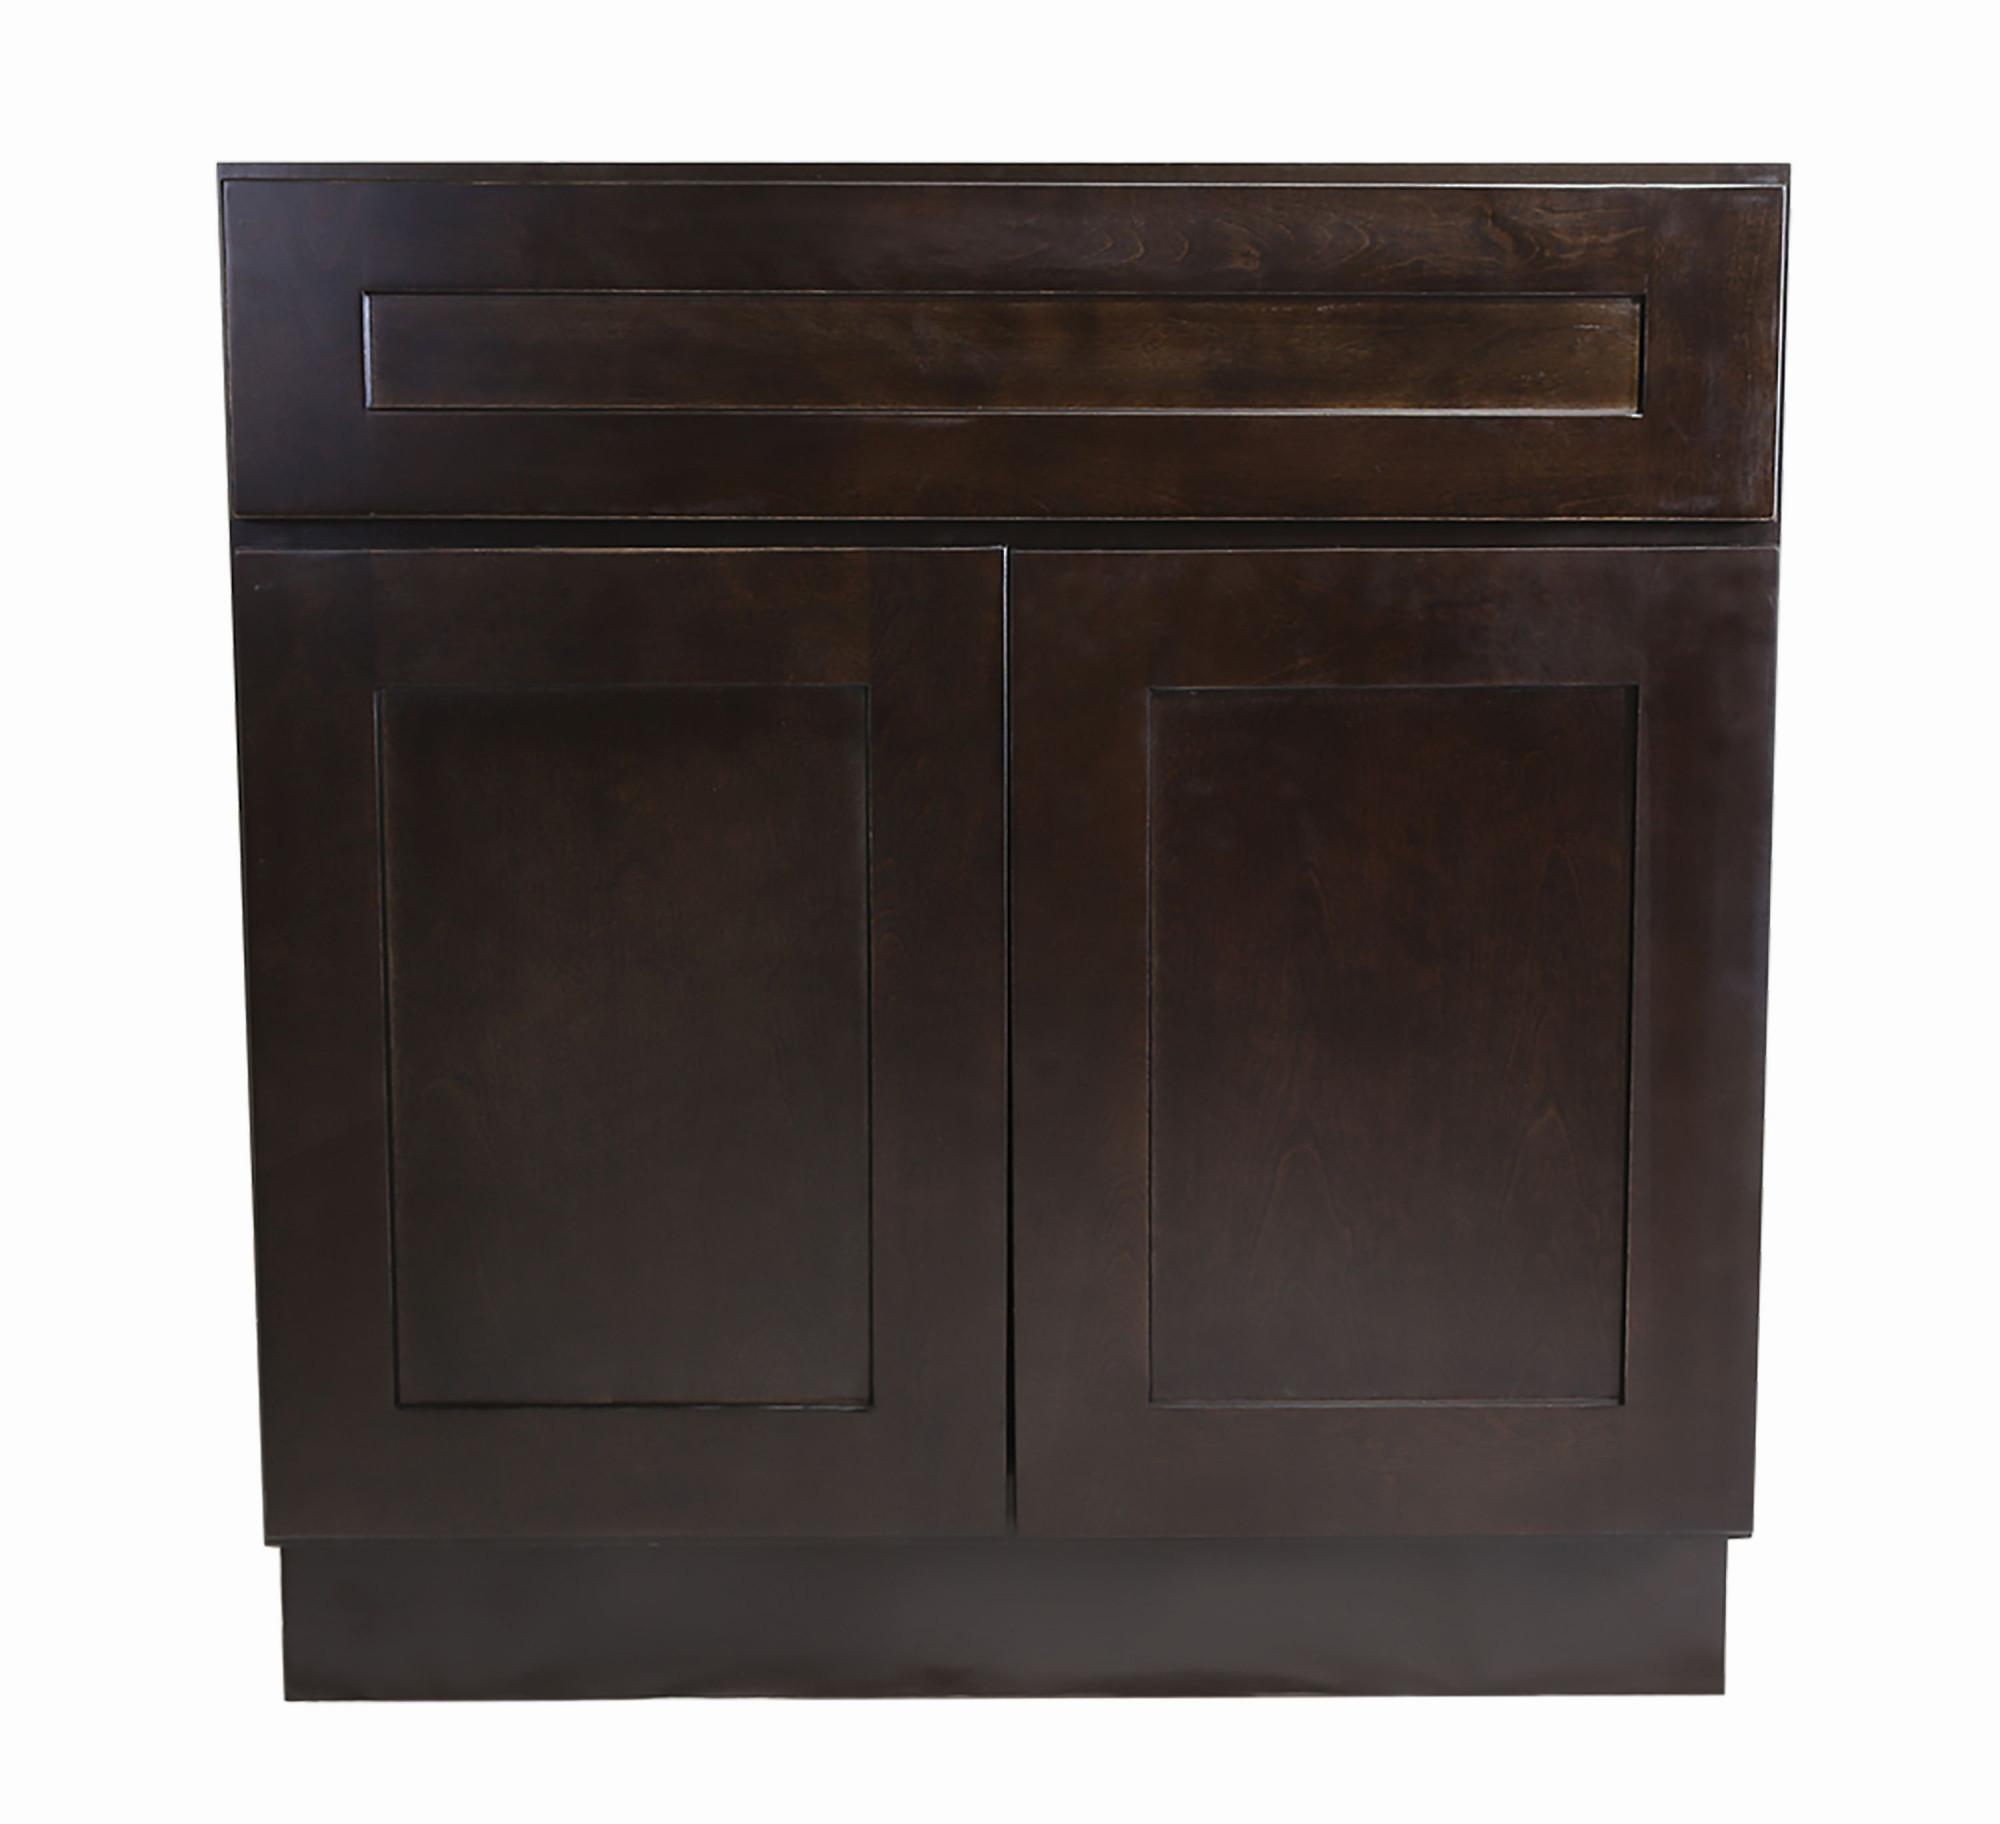 Design House 562066 Brookings 30 Wide X 34 1 2 High Double Door Base Cabinet W